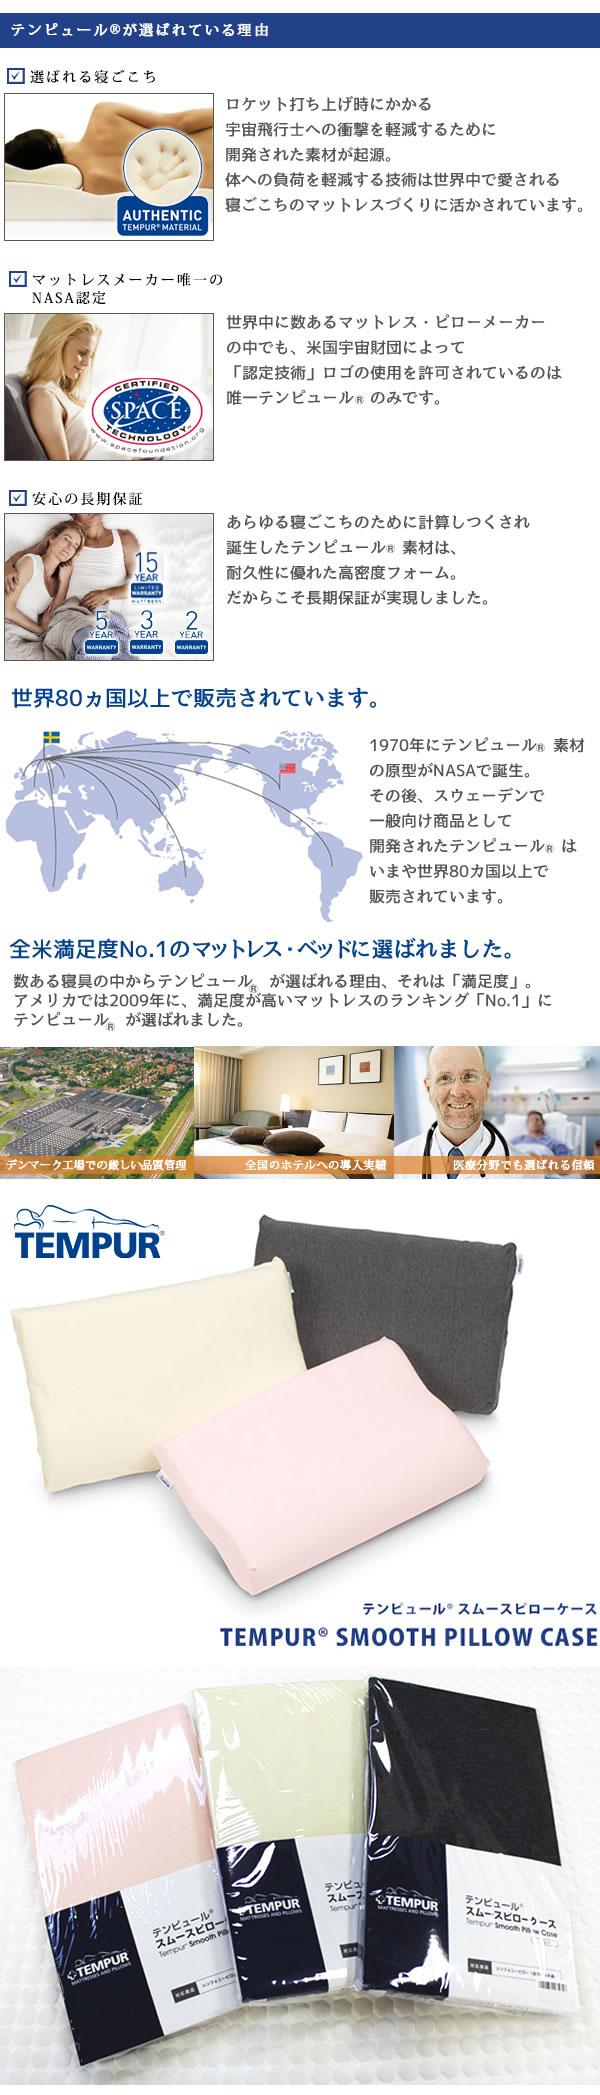 TEMPUR テンピュール スムースピロケース(シンフォニーピロー対応)